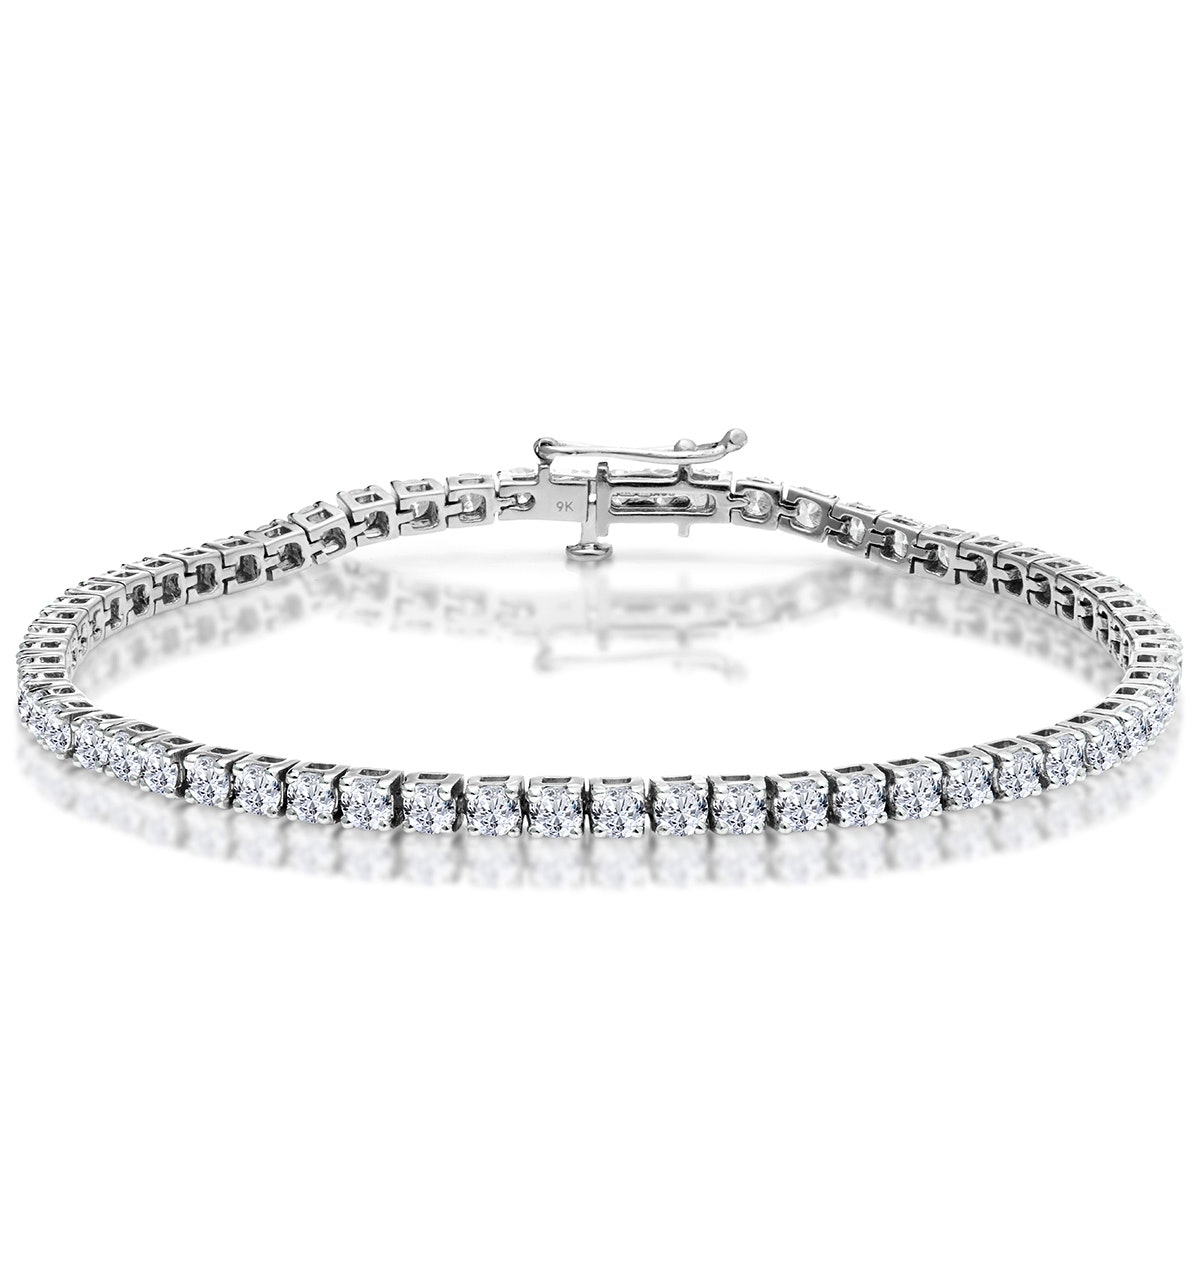 5ct Diamond Tennis Bracelet Claw Set in 9K White Gold